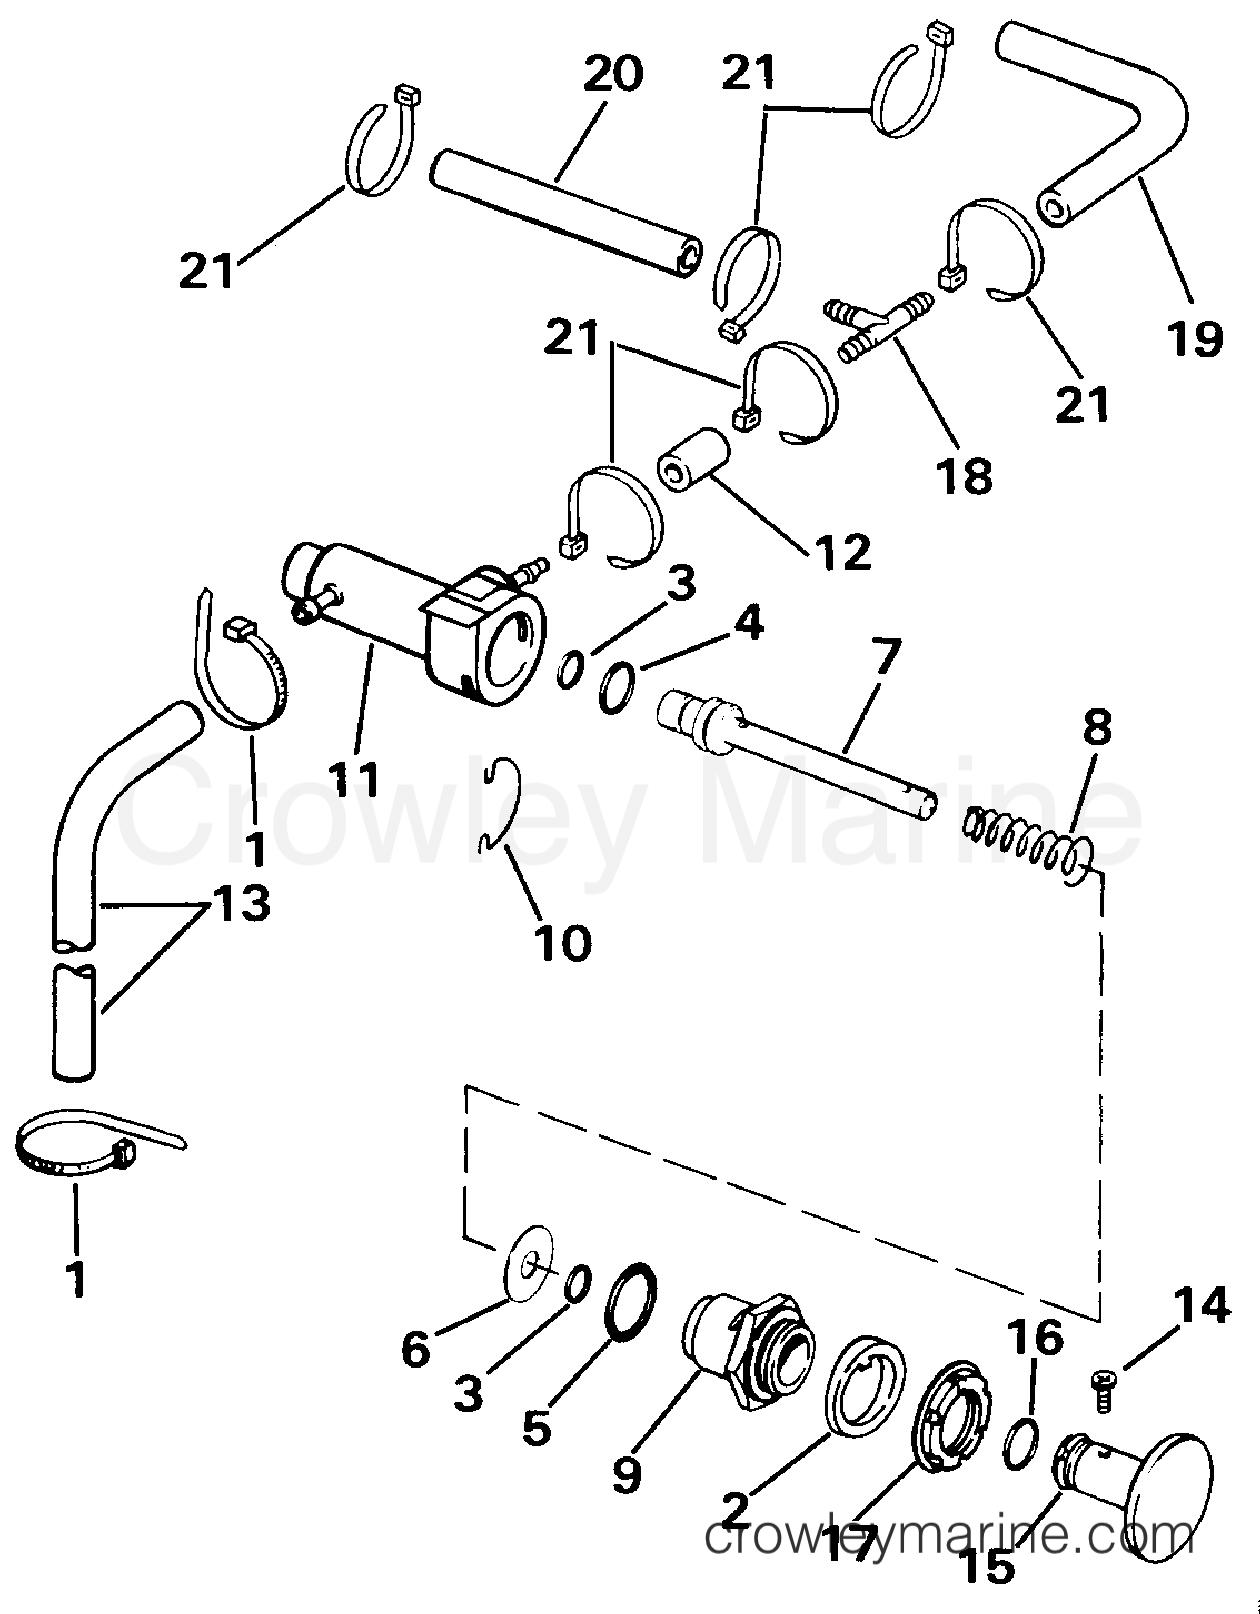 Manual Primer System